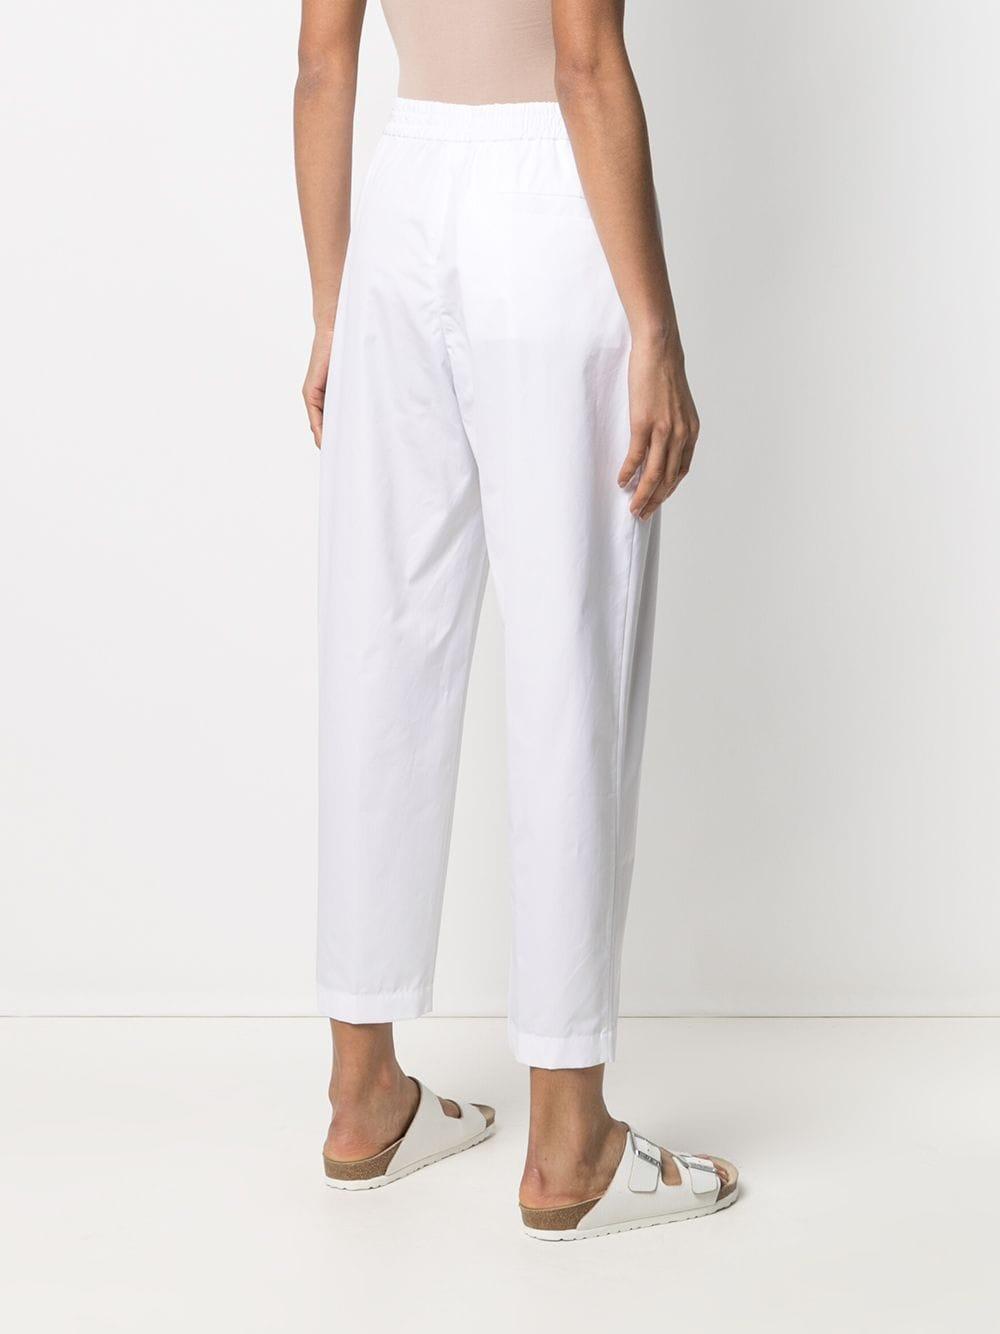 Pantaloni bianchi corti affusolati in cotone a vita alta ASPESI | Pantaloni | H115-D30785072